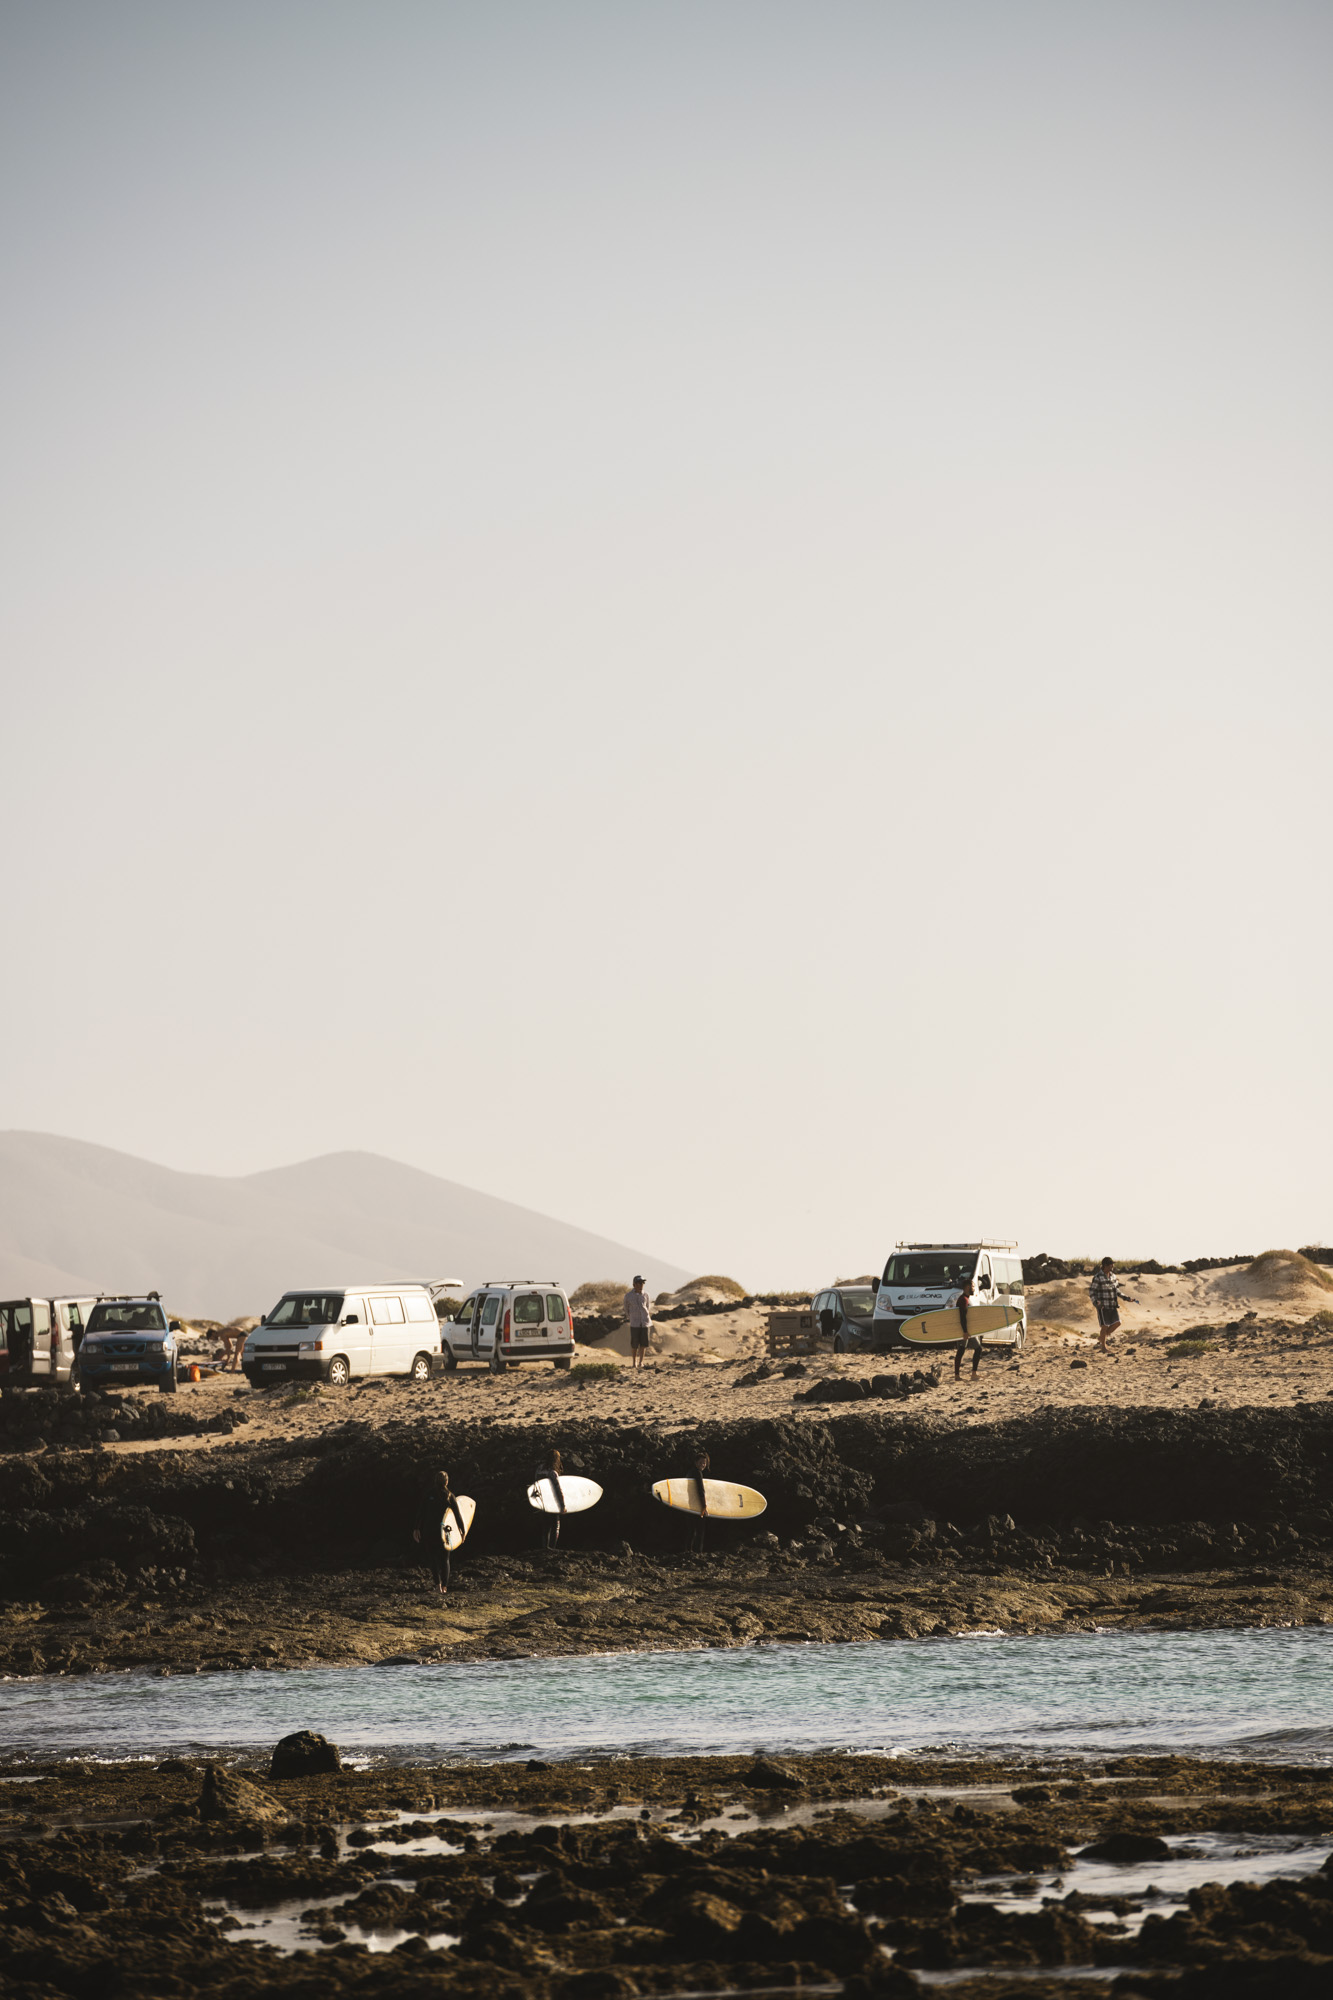 190217_Fuerteventura D850_8508166-Bearbeitet.jpg